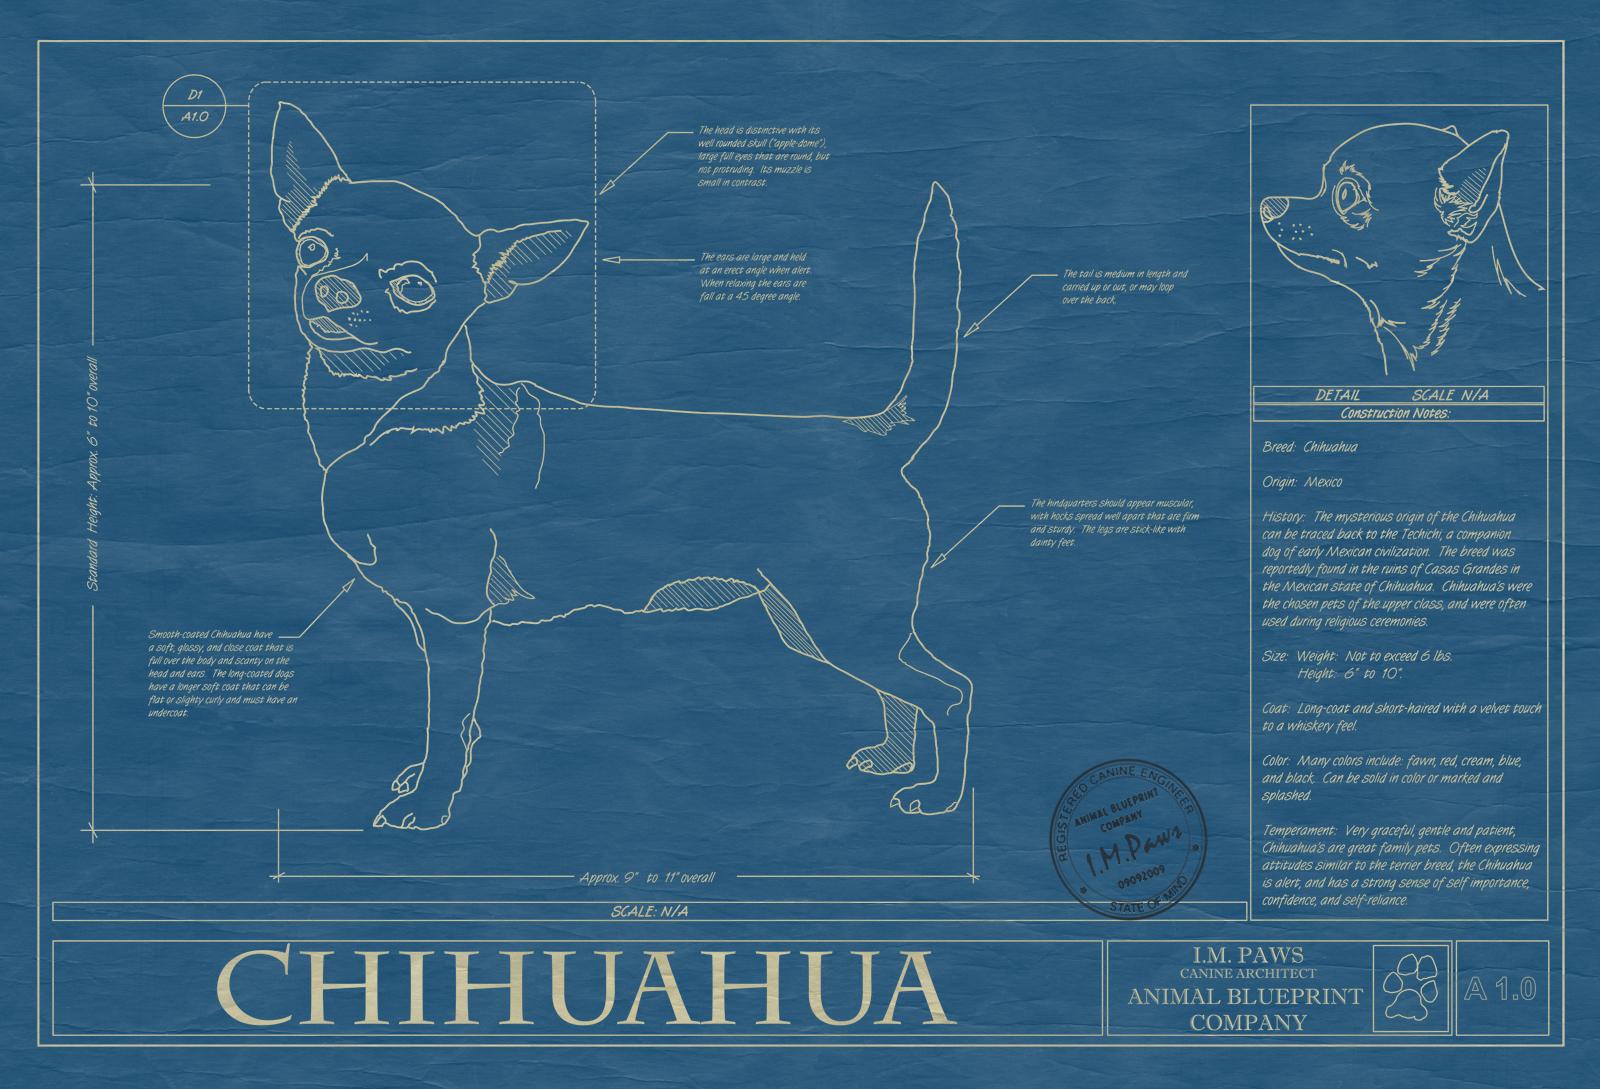 Chihuahua animal blueprint company chihuahua dog blueprint malvernweather Images